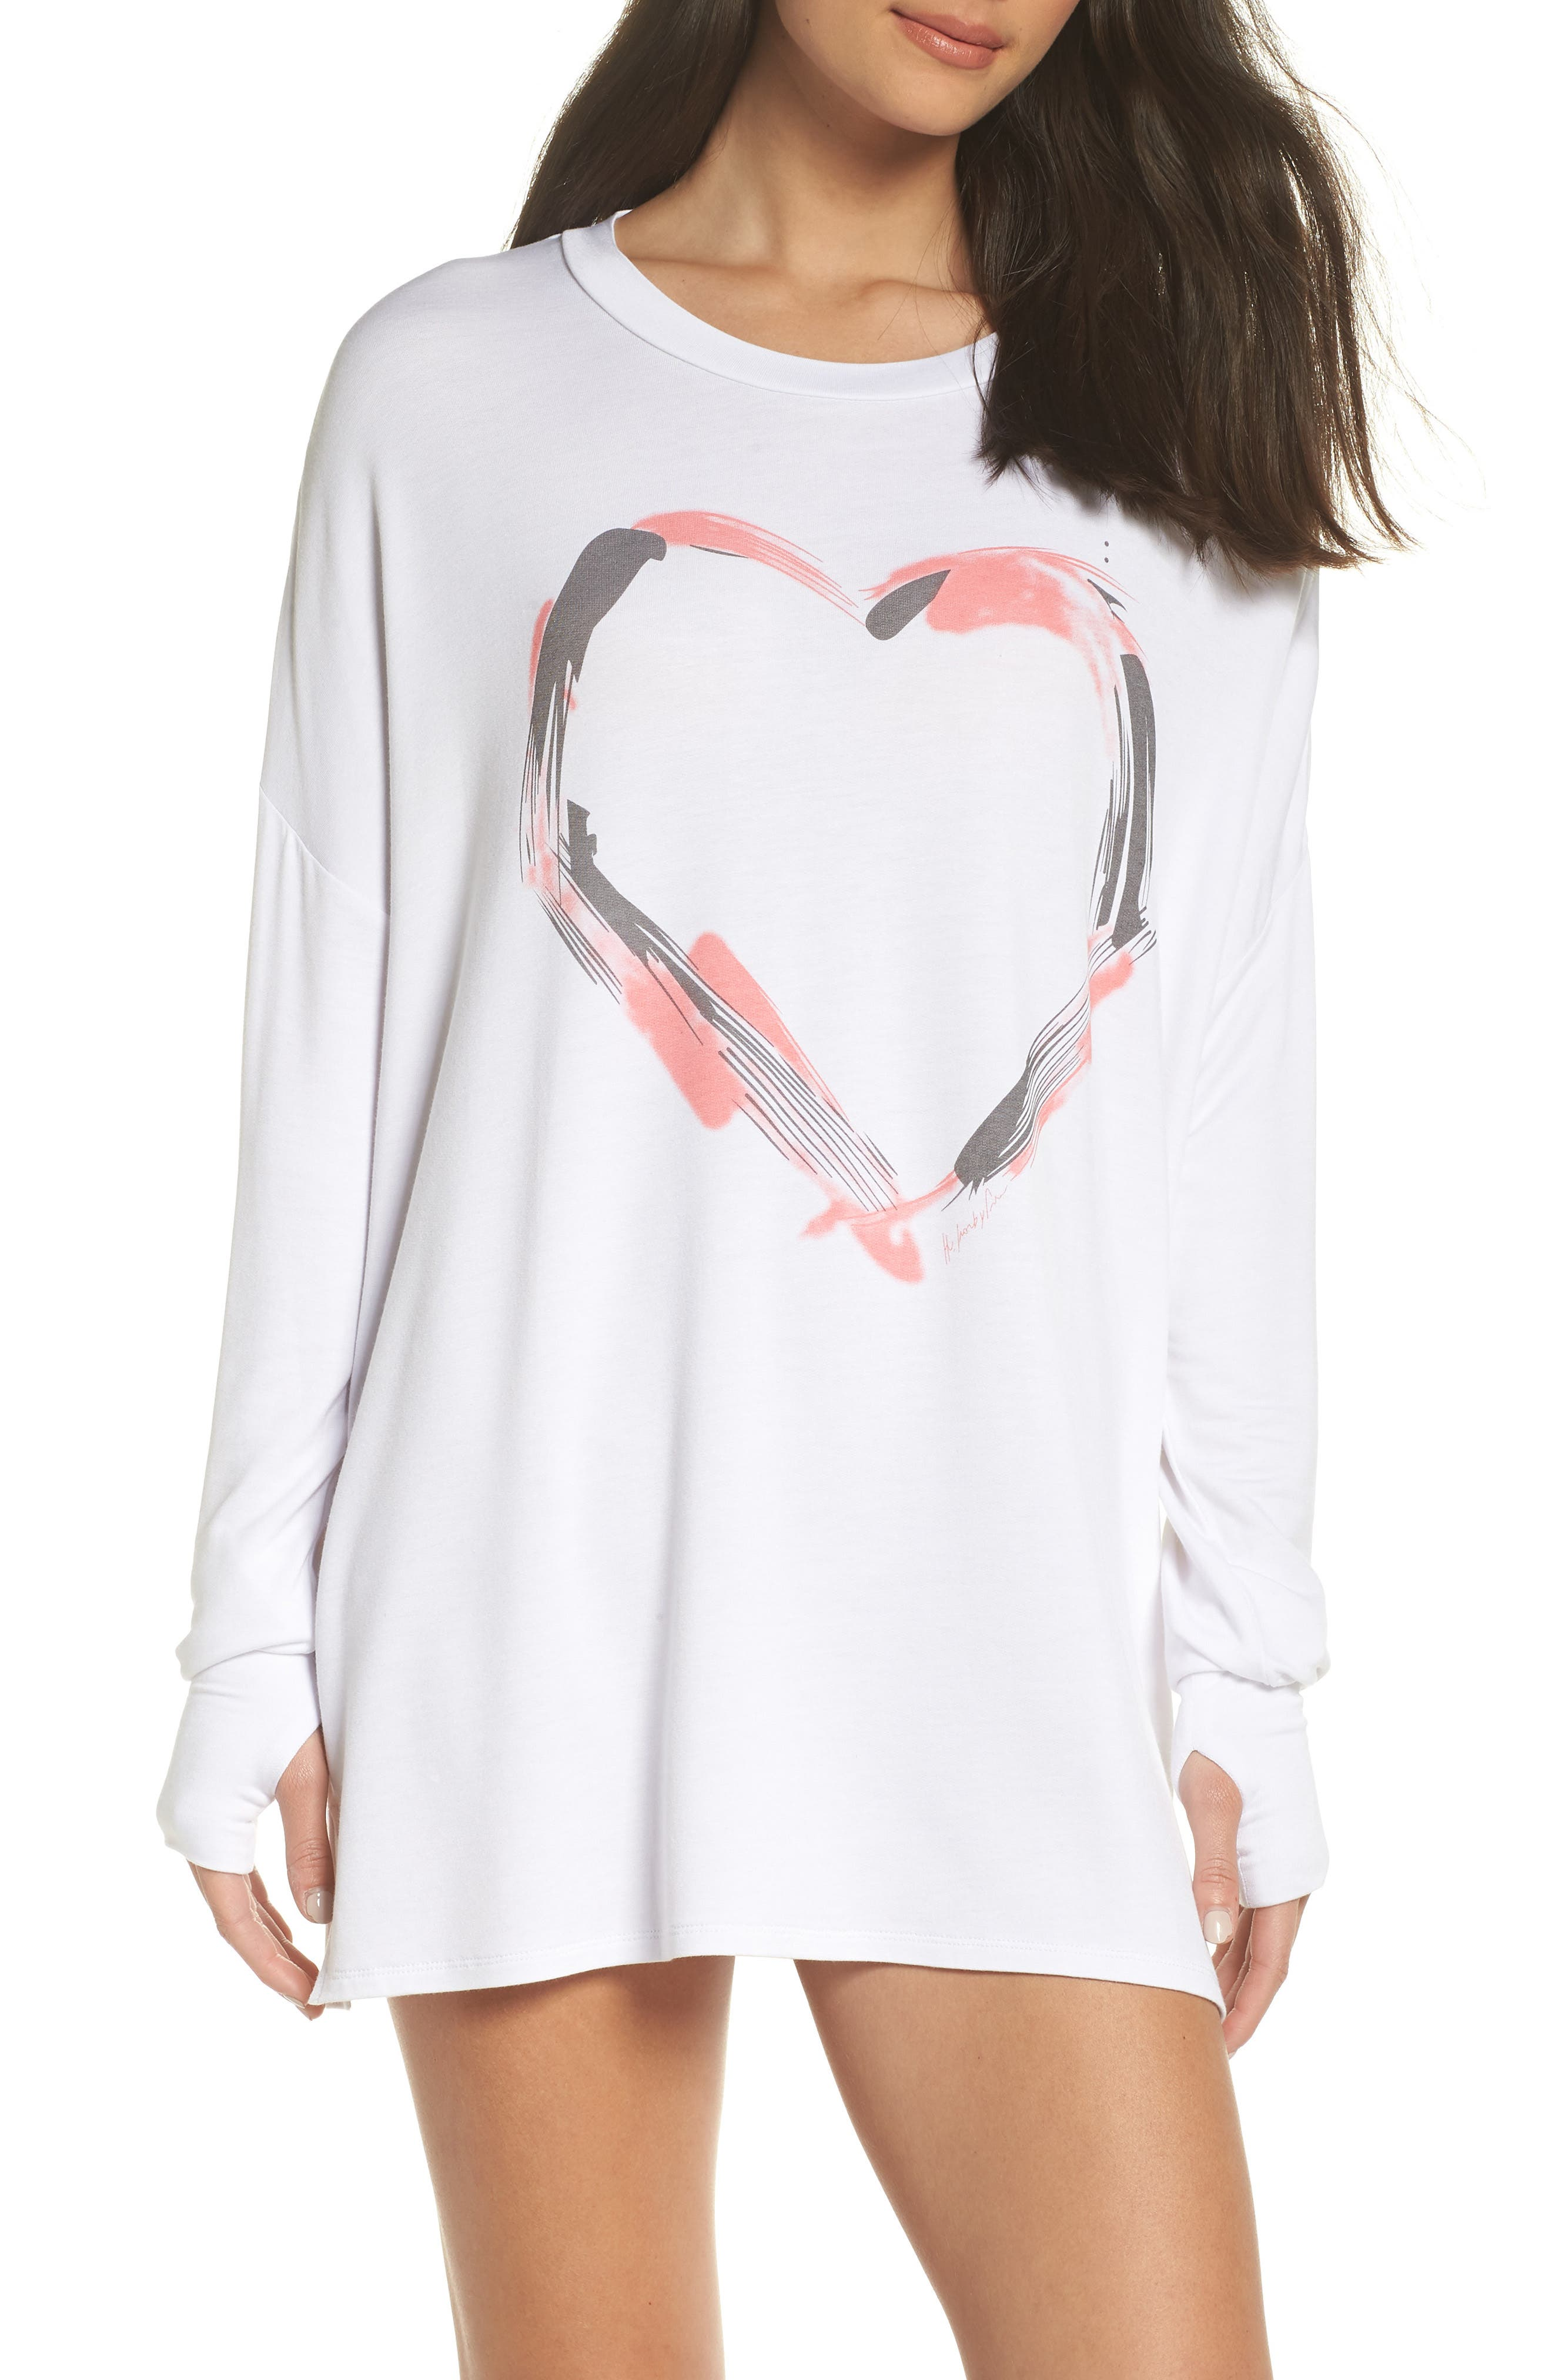 Heart Strokes Sleep Shirt,                             Main thumbnail 1, color,                             WHITE